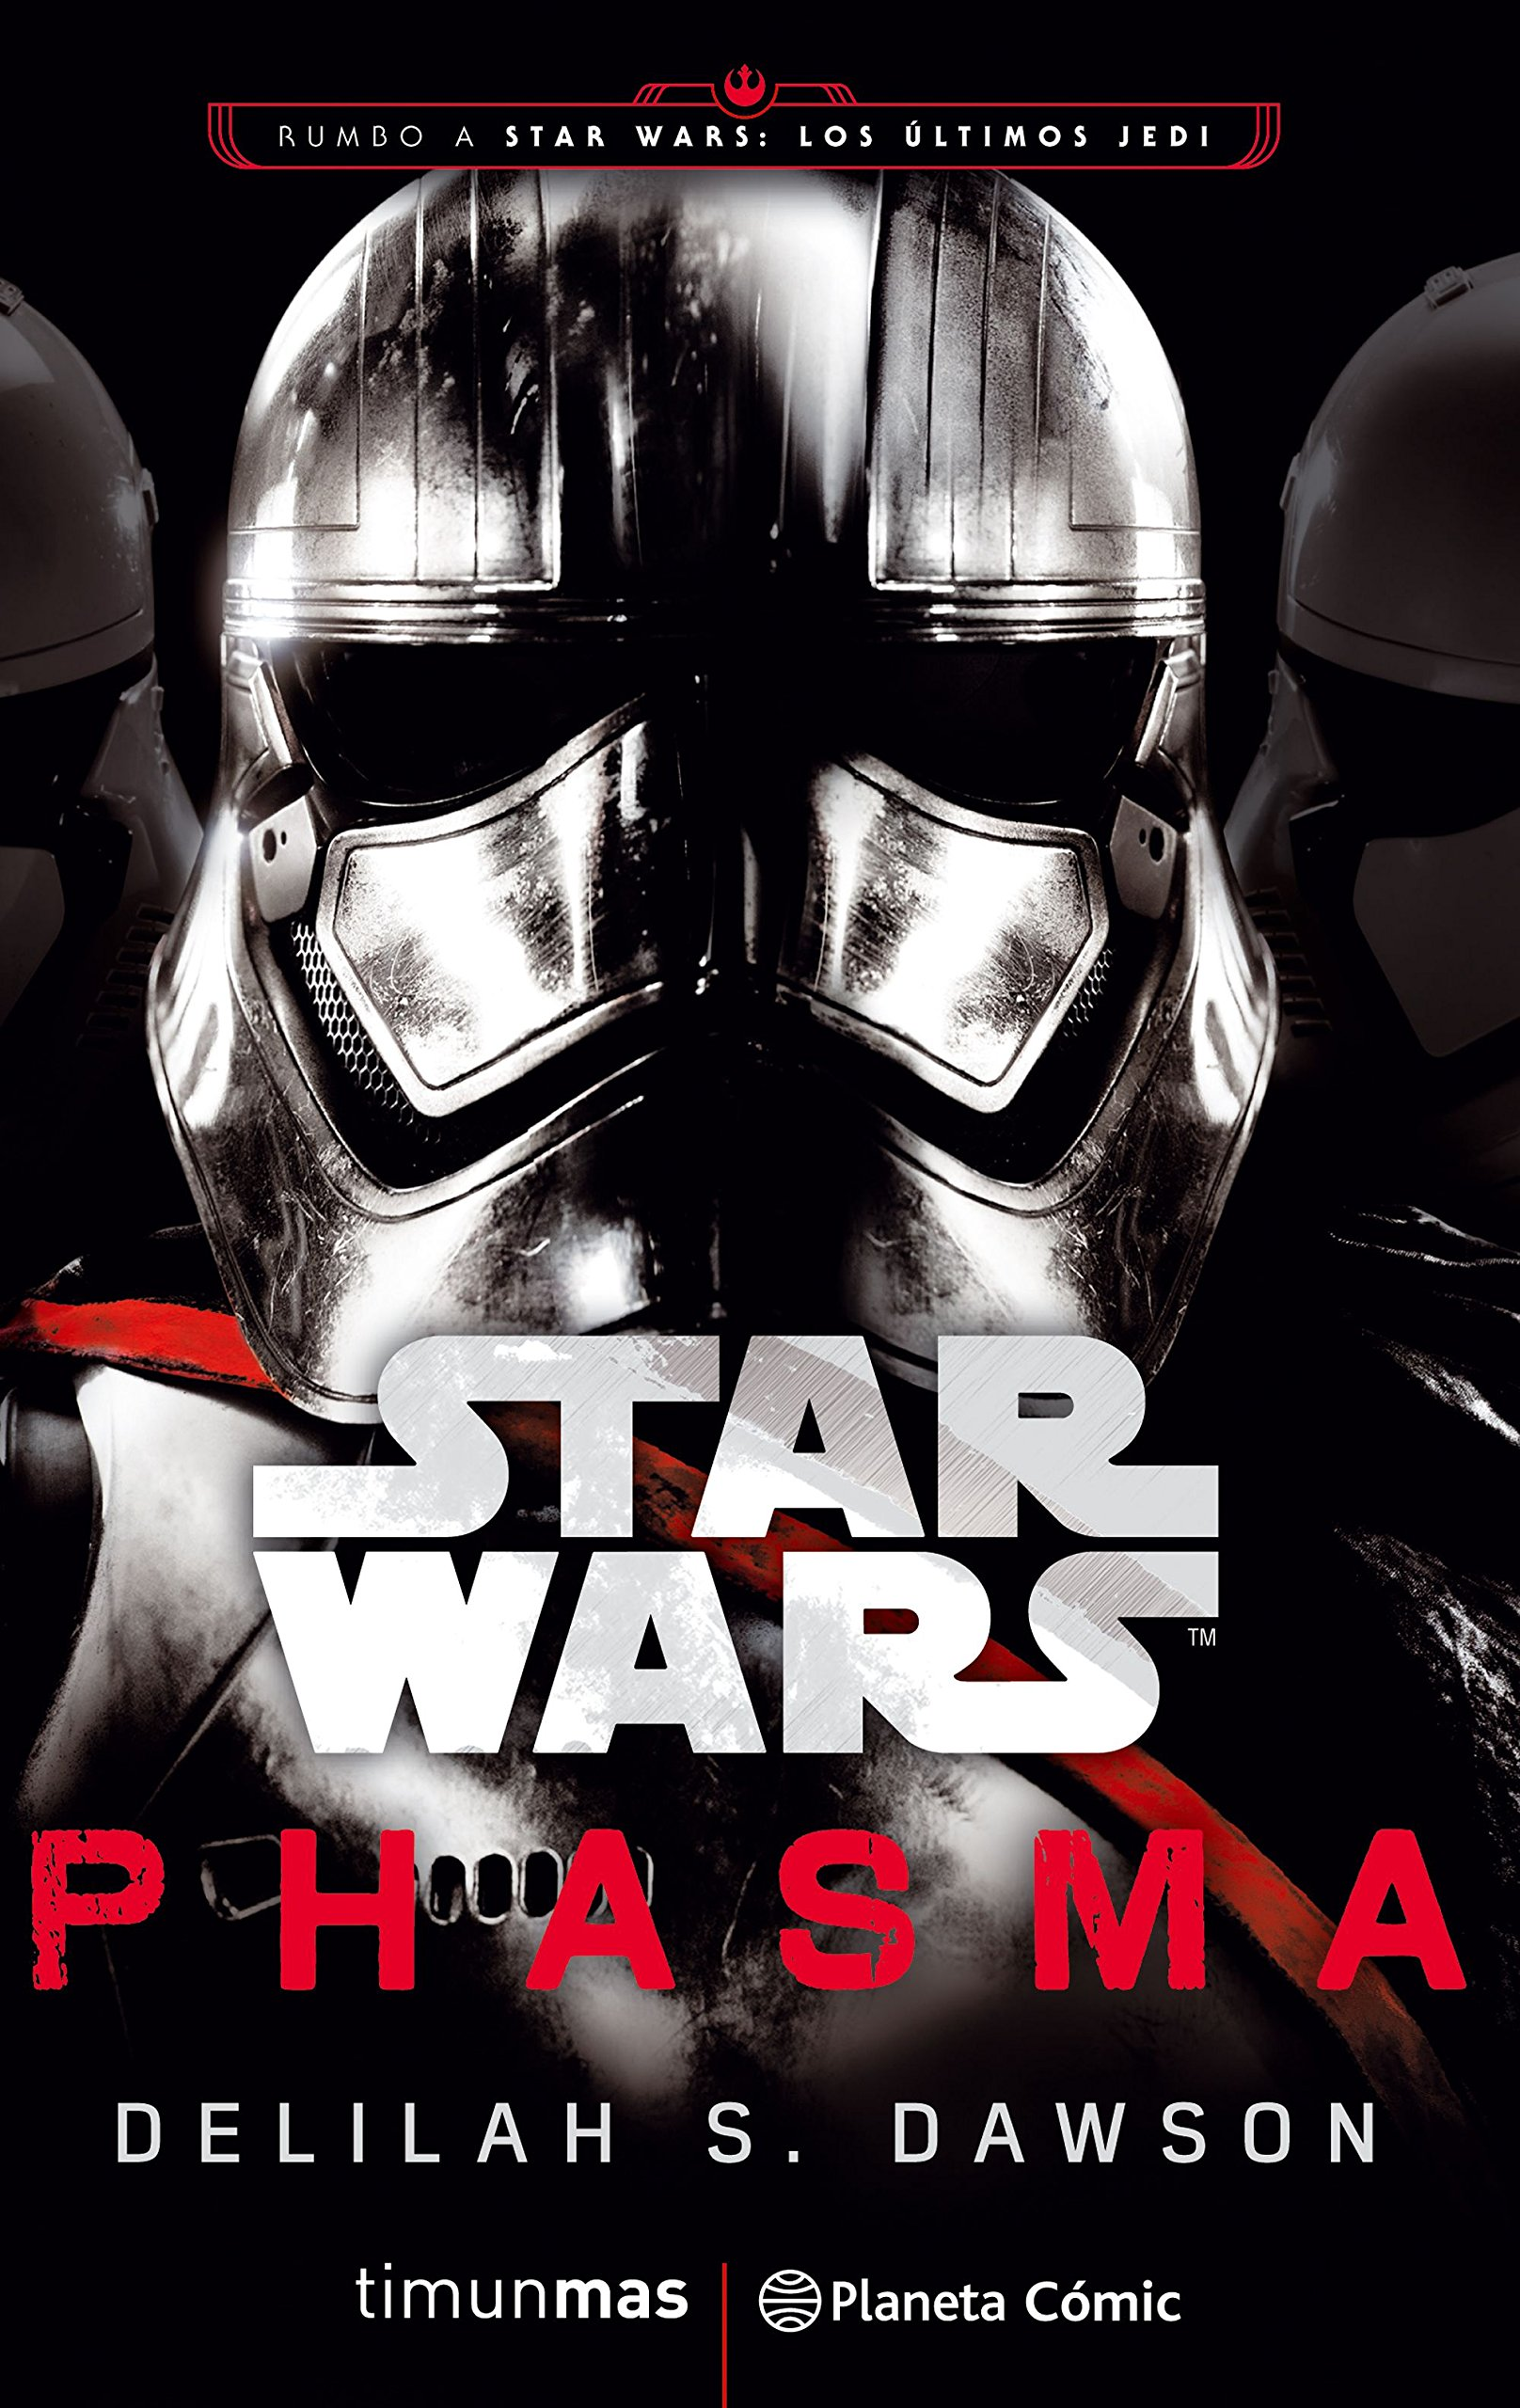 Star Wars Episodio VIII Phasma novela Star Wars: Novelas: Amazon.es: Delilah S. Dawson, Muñoz Cunill, Jaume: Libros